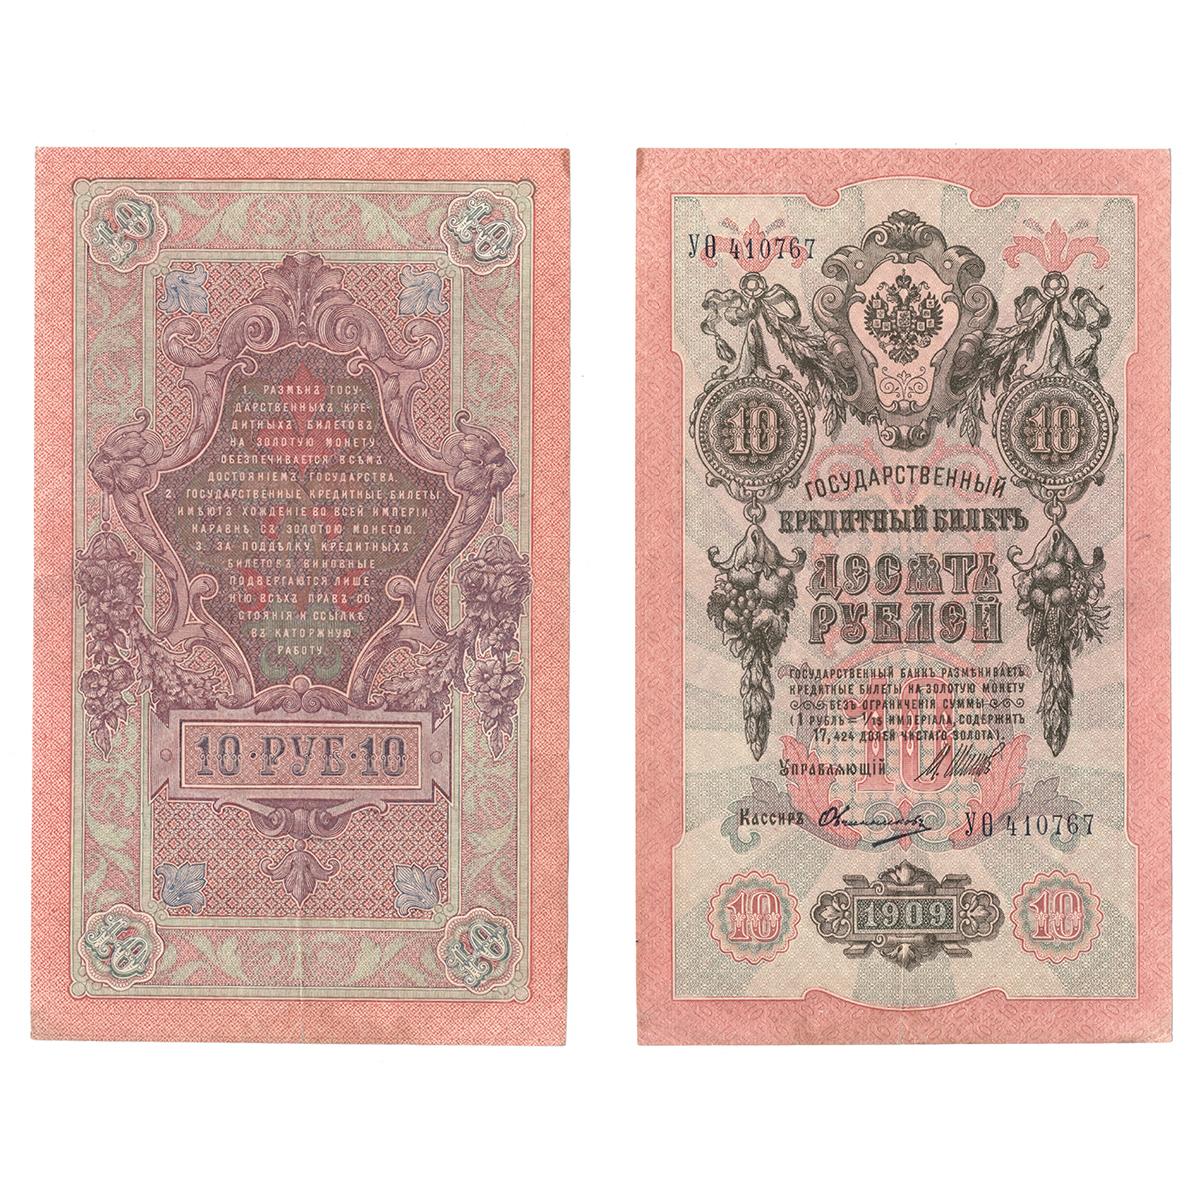 10 рублей 1909 г. Шипов Овчинников. Серия: -УО- VF+